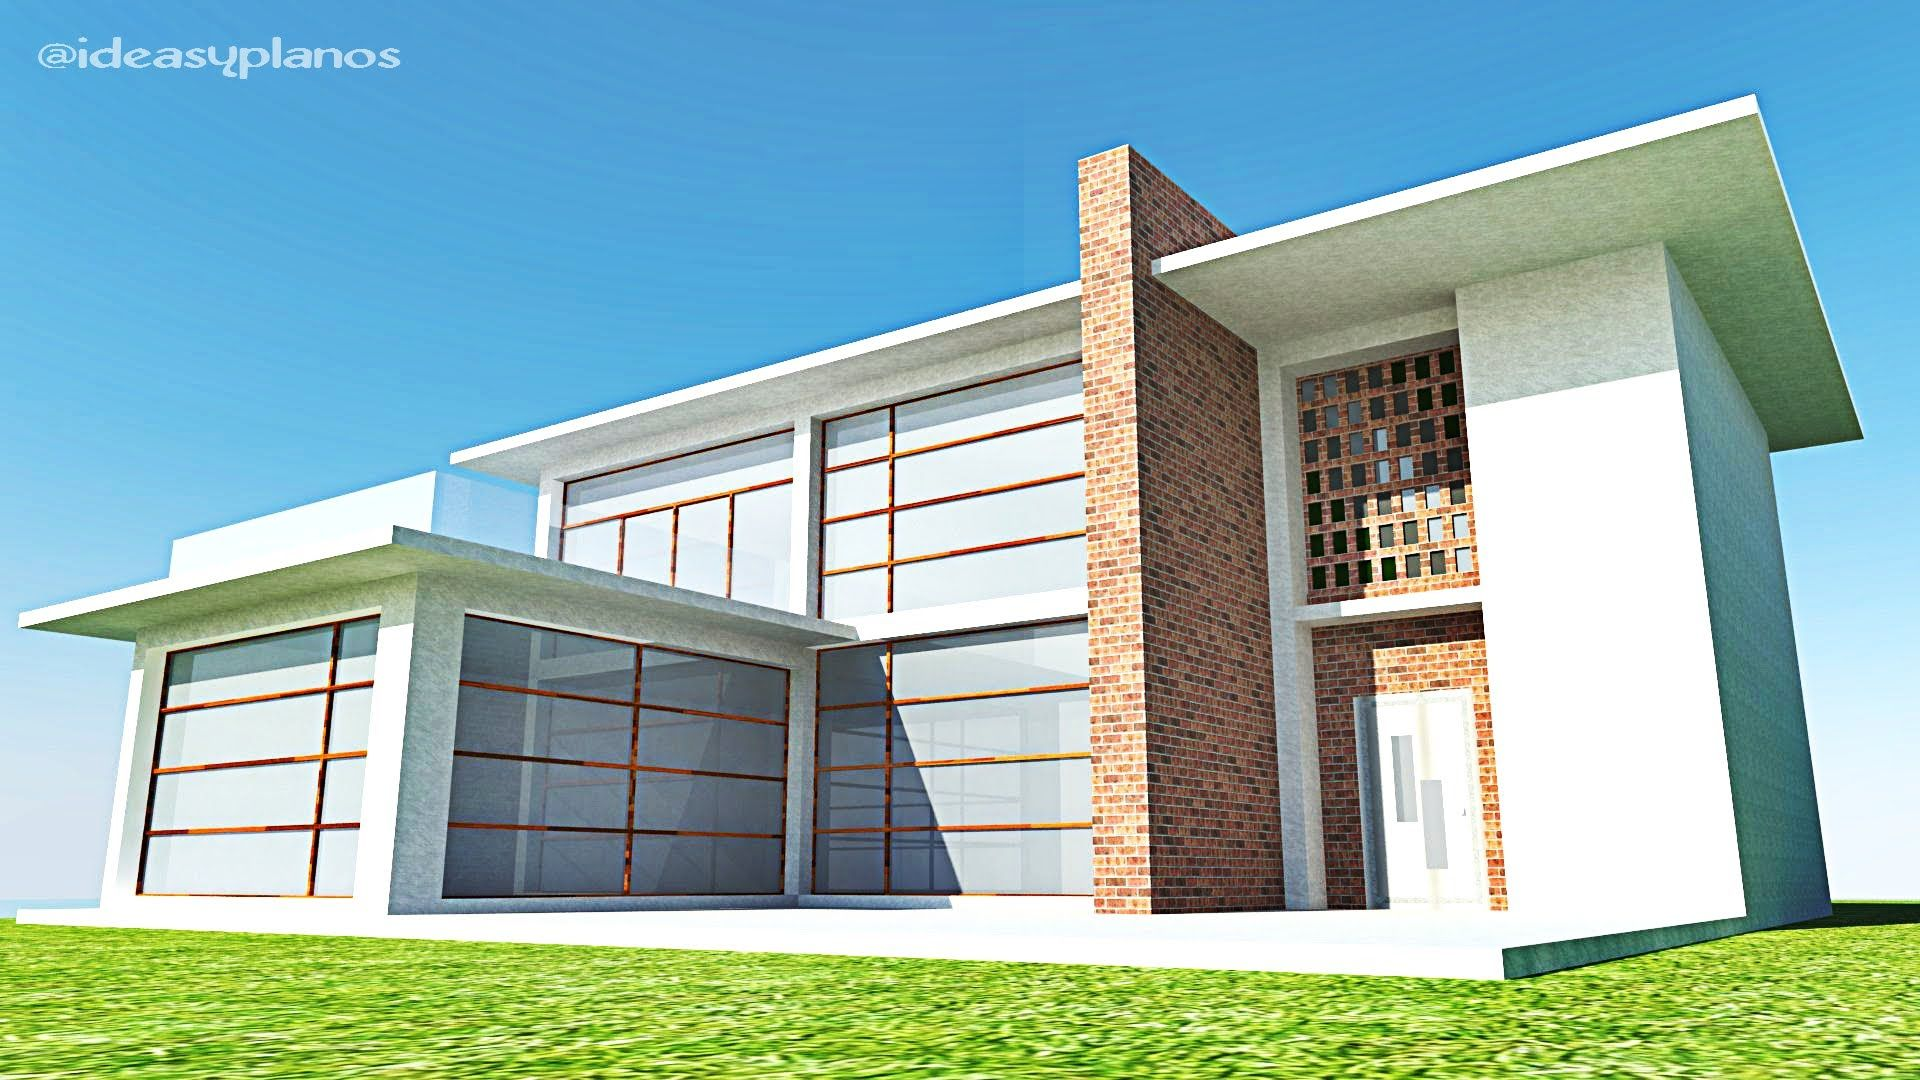 NEW Home - schönes Haus - Inspiration Google SketchUp Model ...